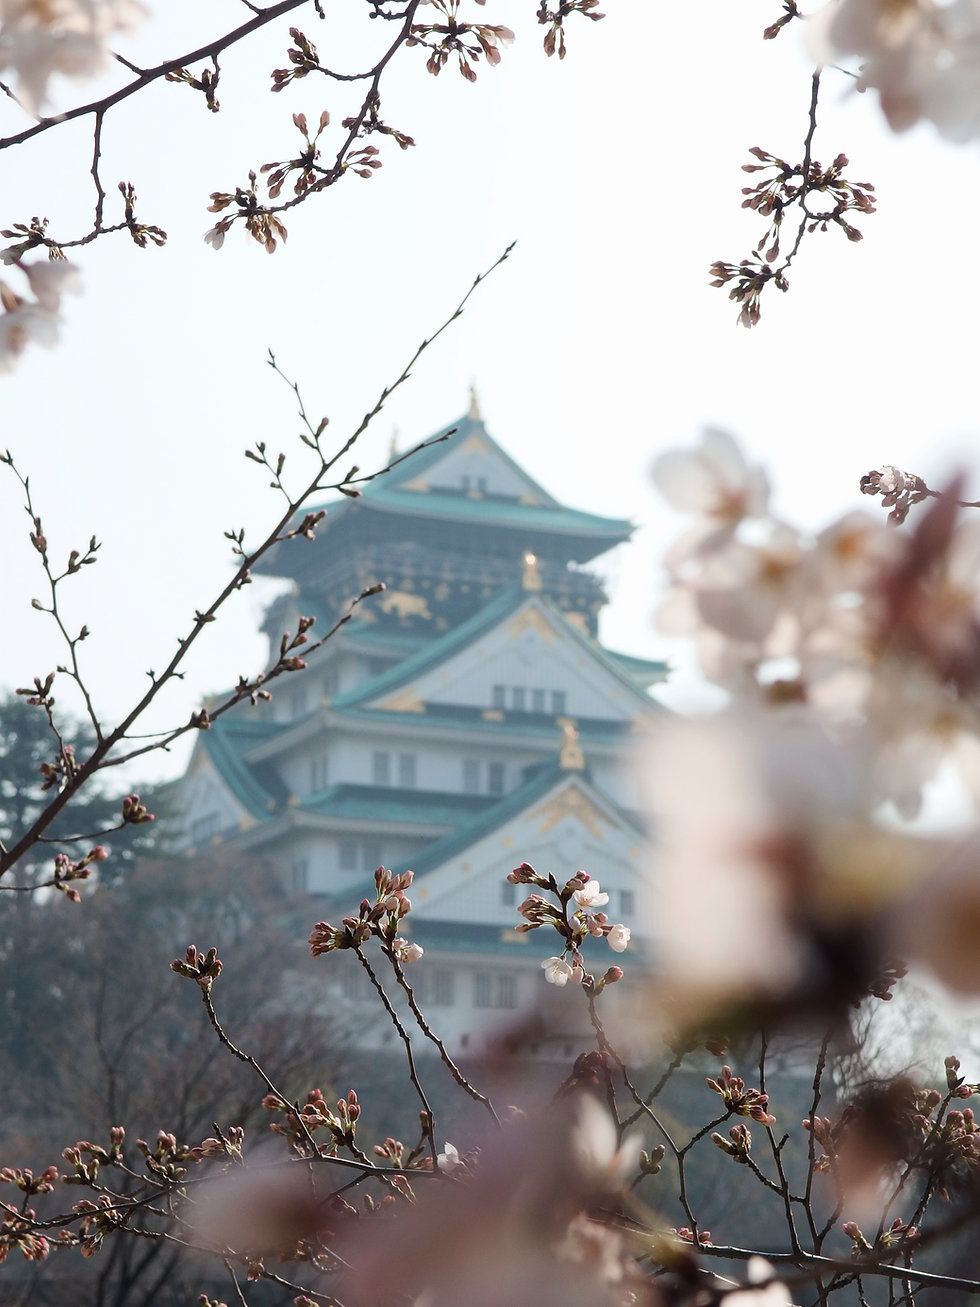 Image by Yu Kato